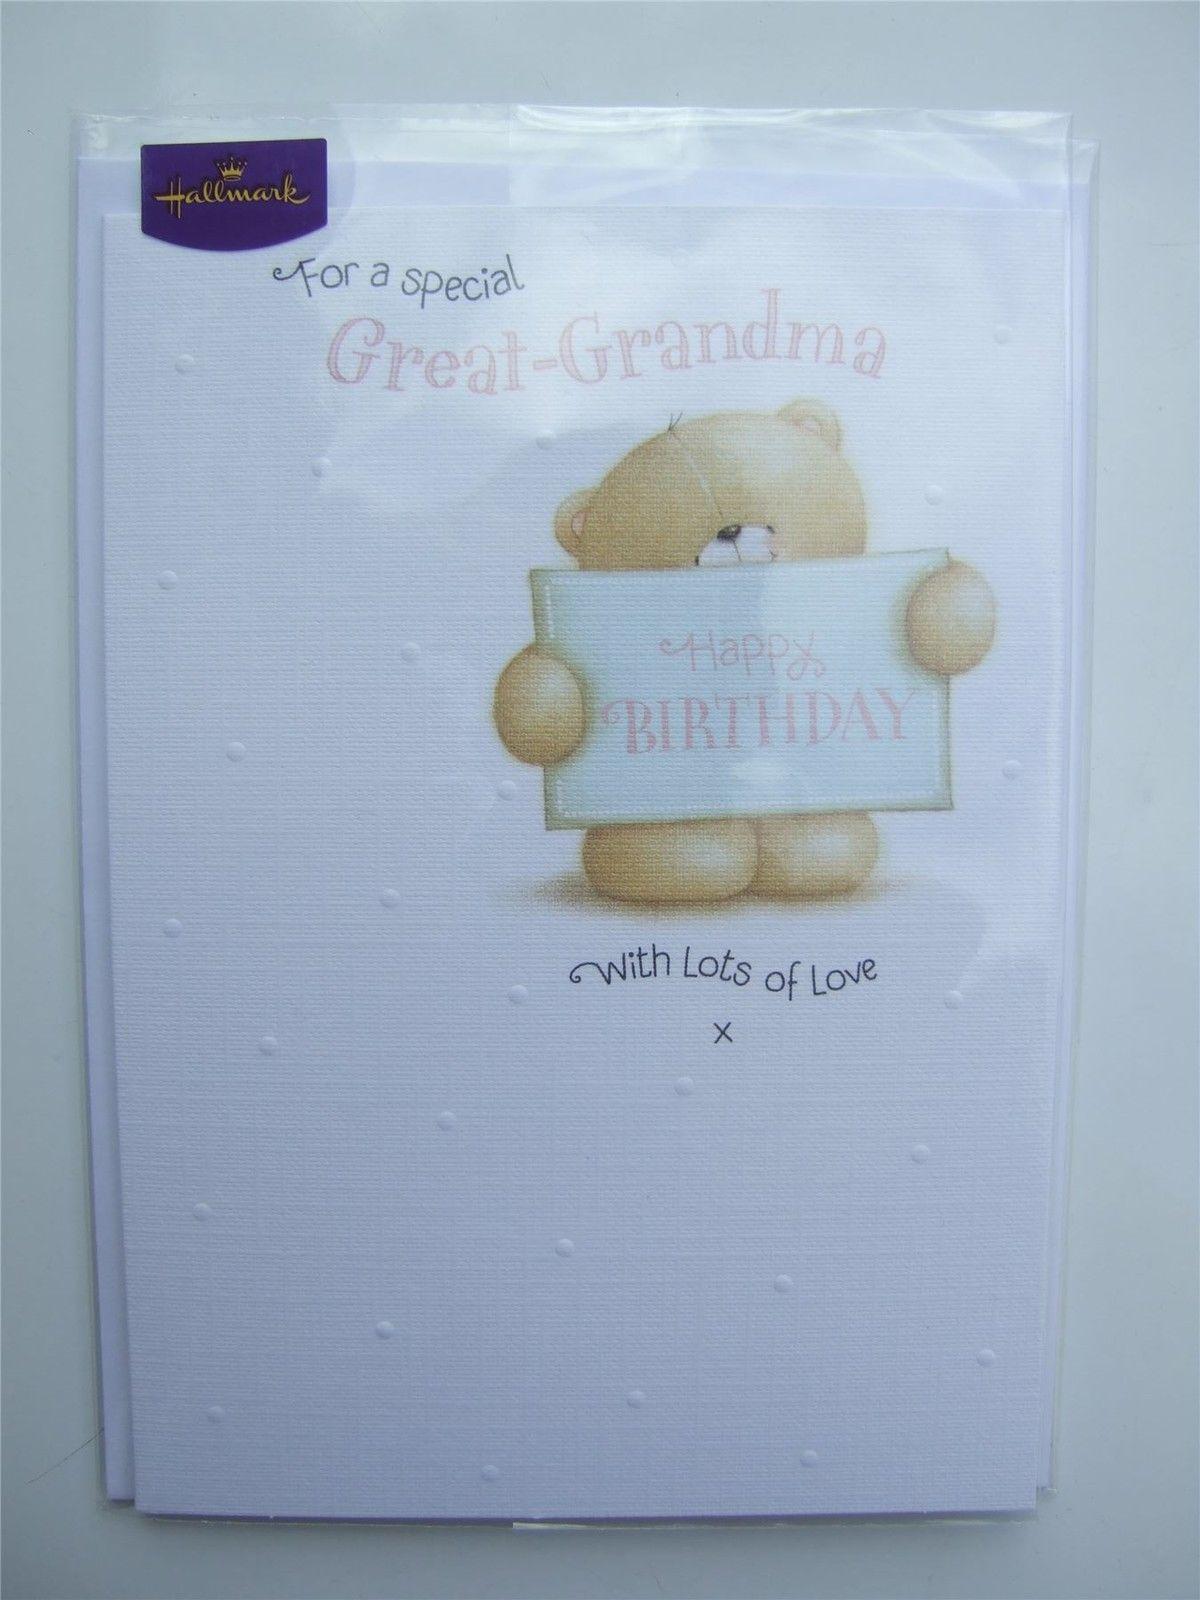 Forever friends happy birthday card for a greatgrandma by hallmark